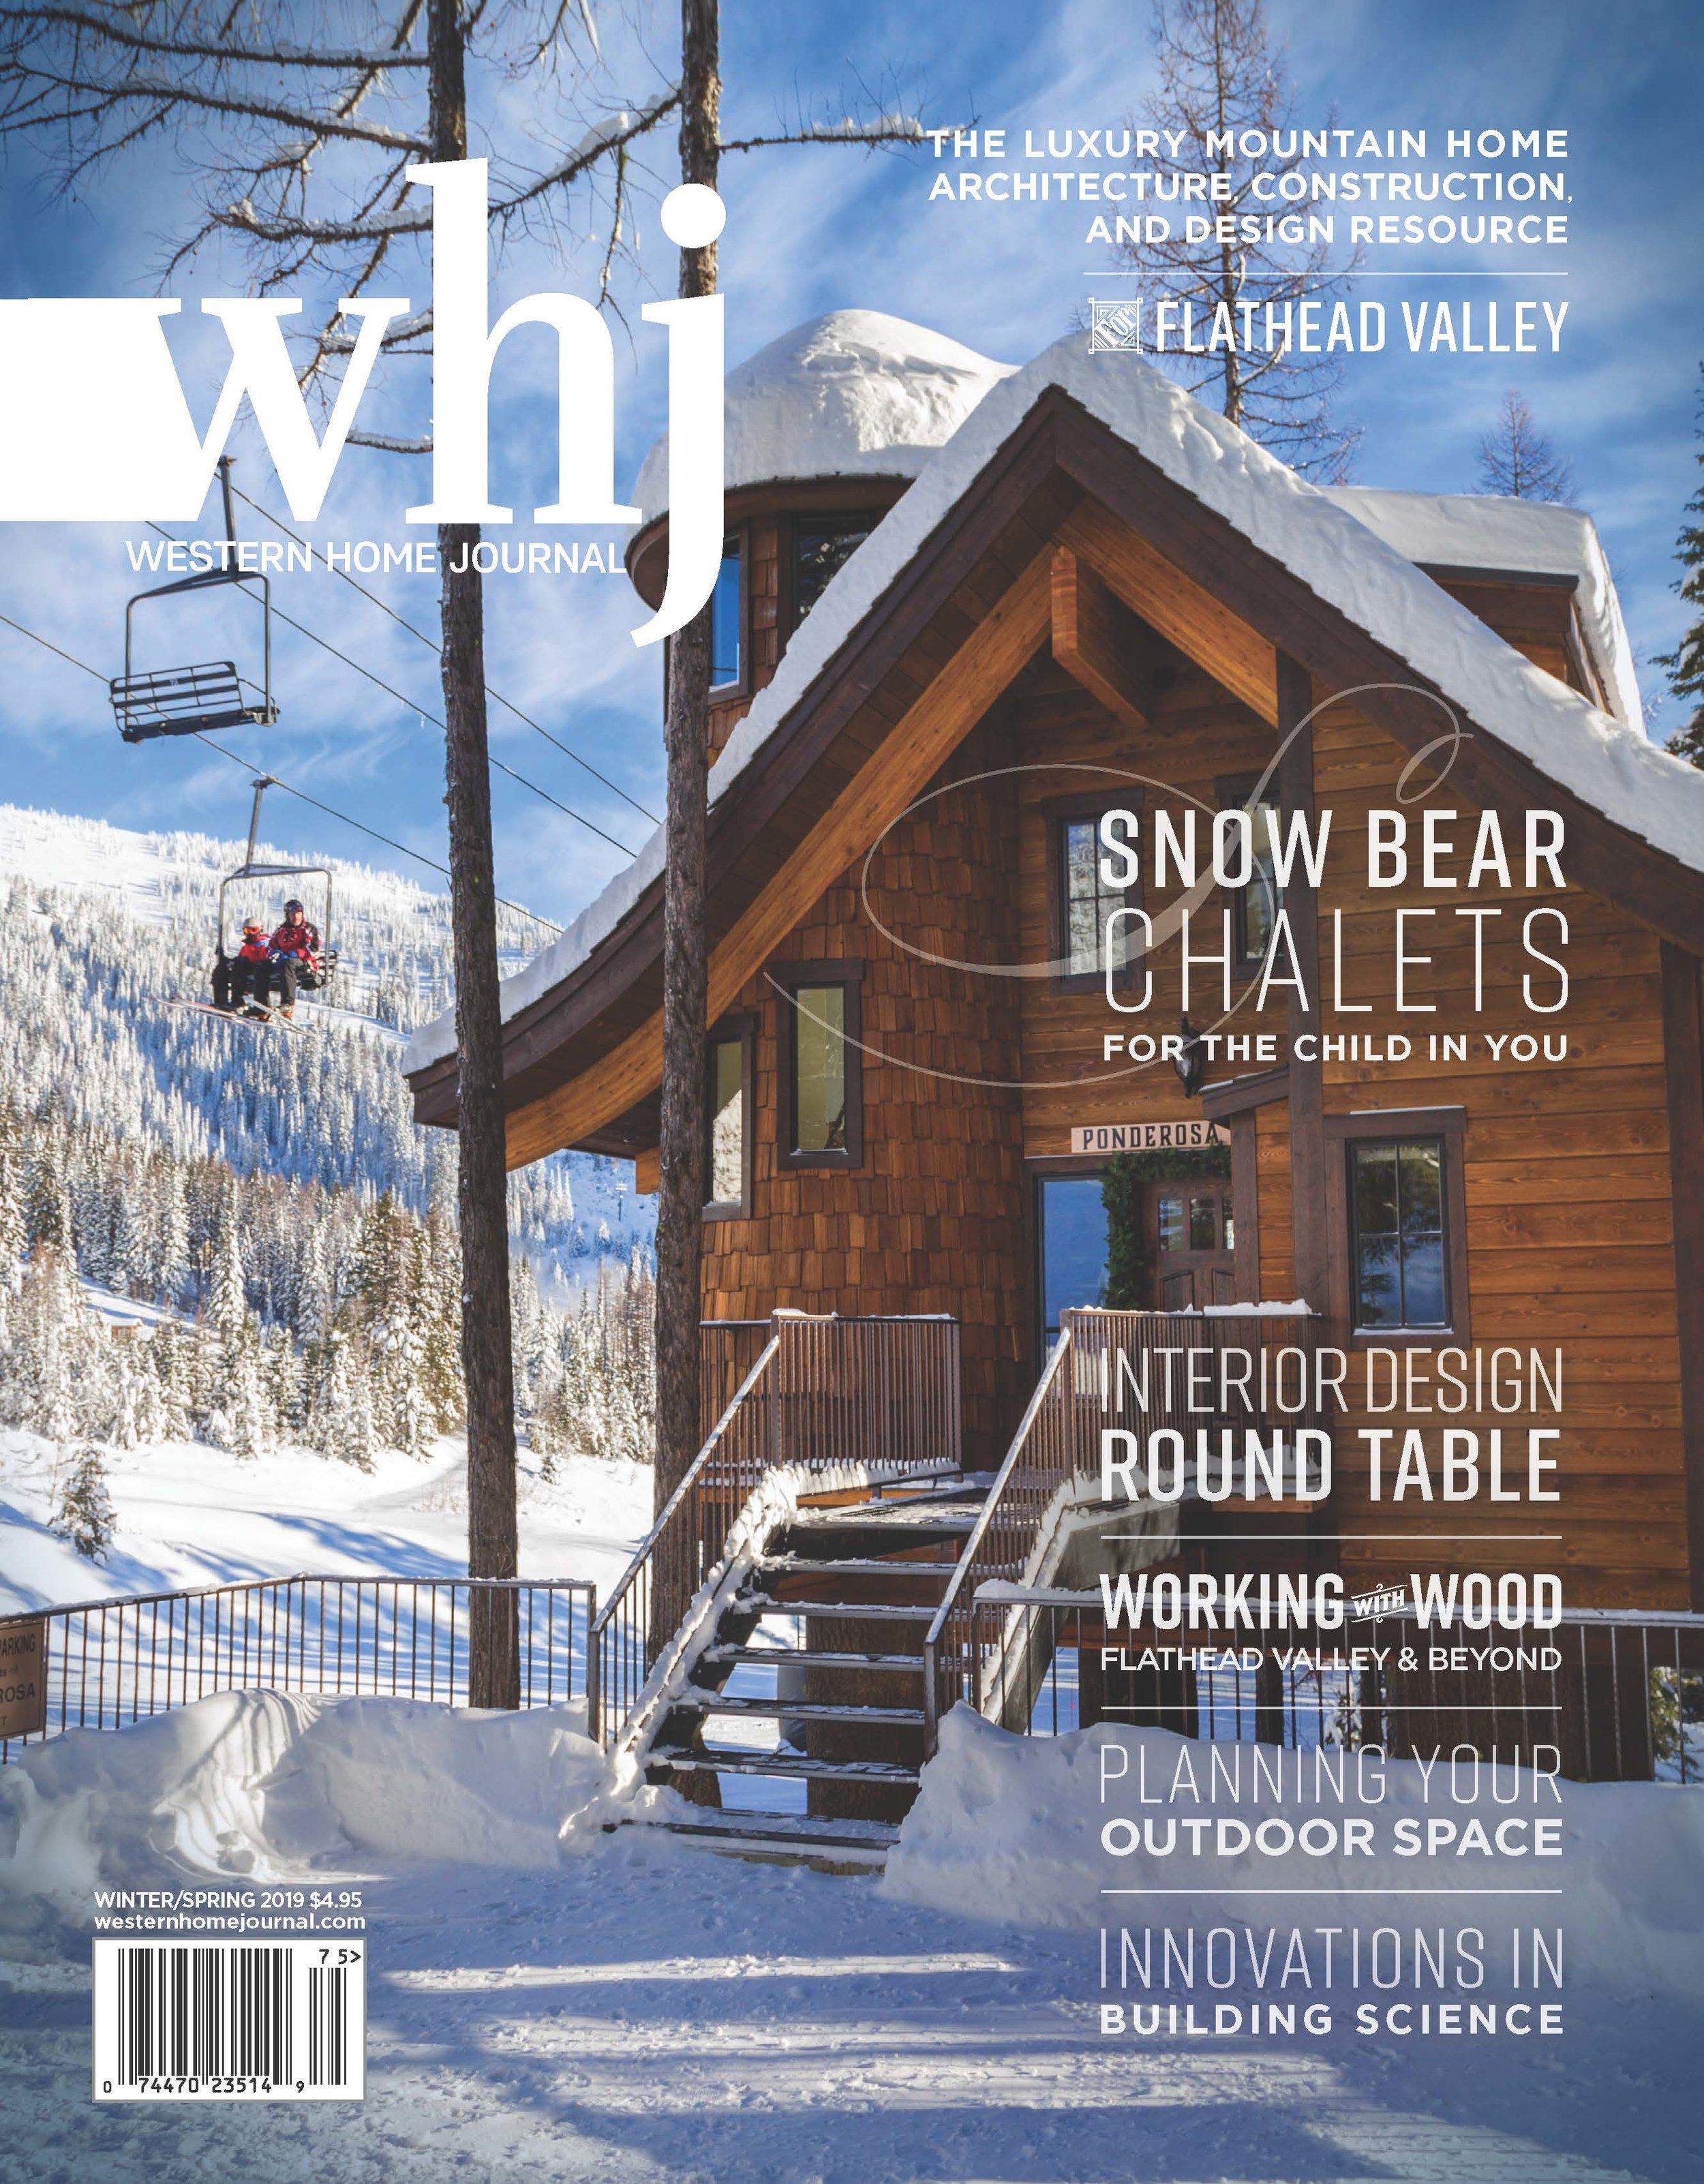 Western Home Journal 25 Year Anniversary